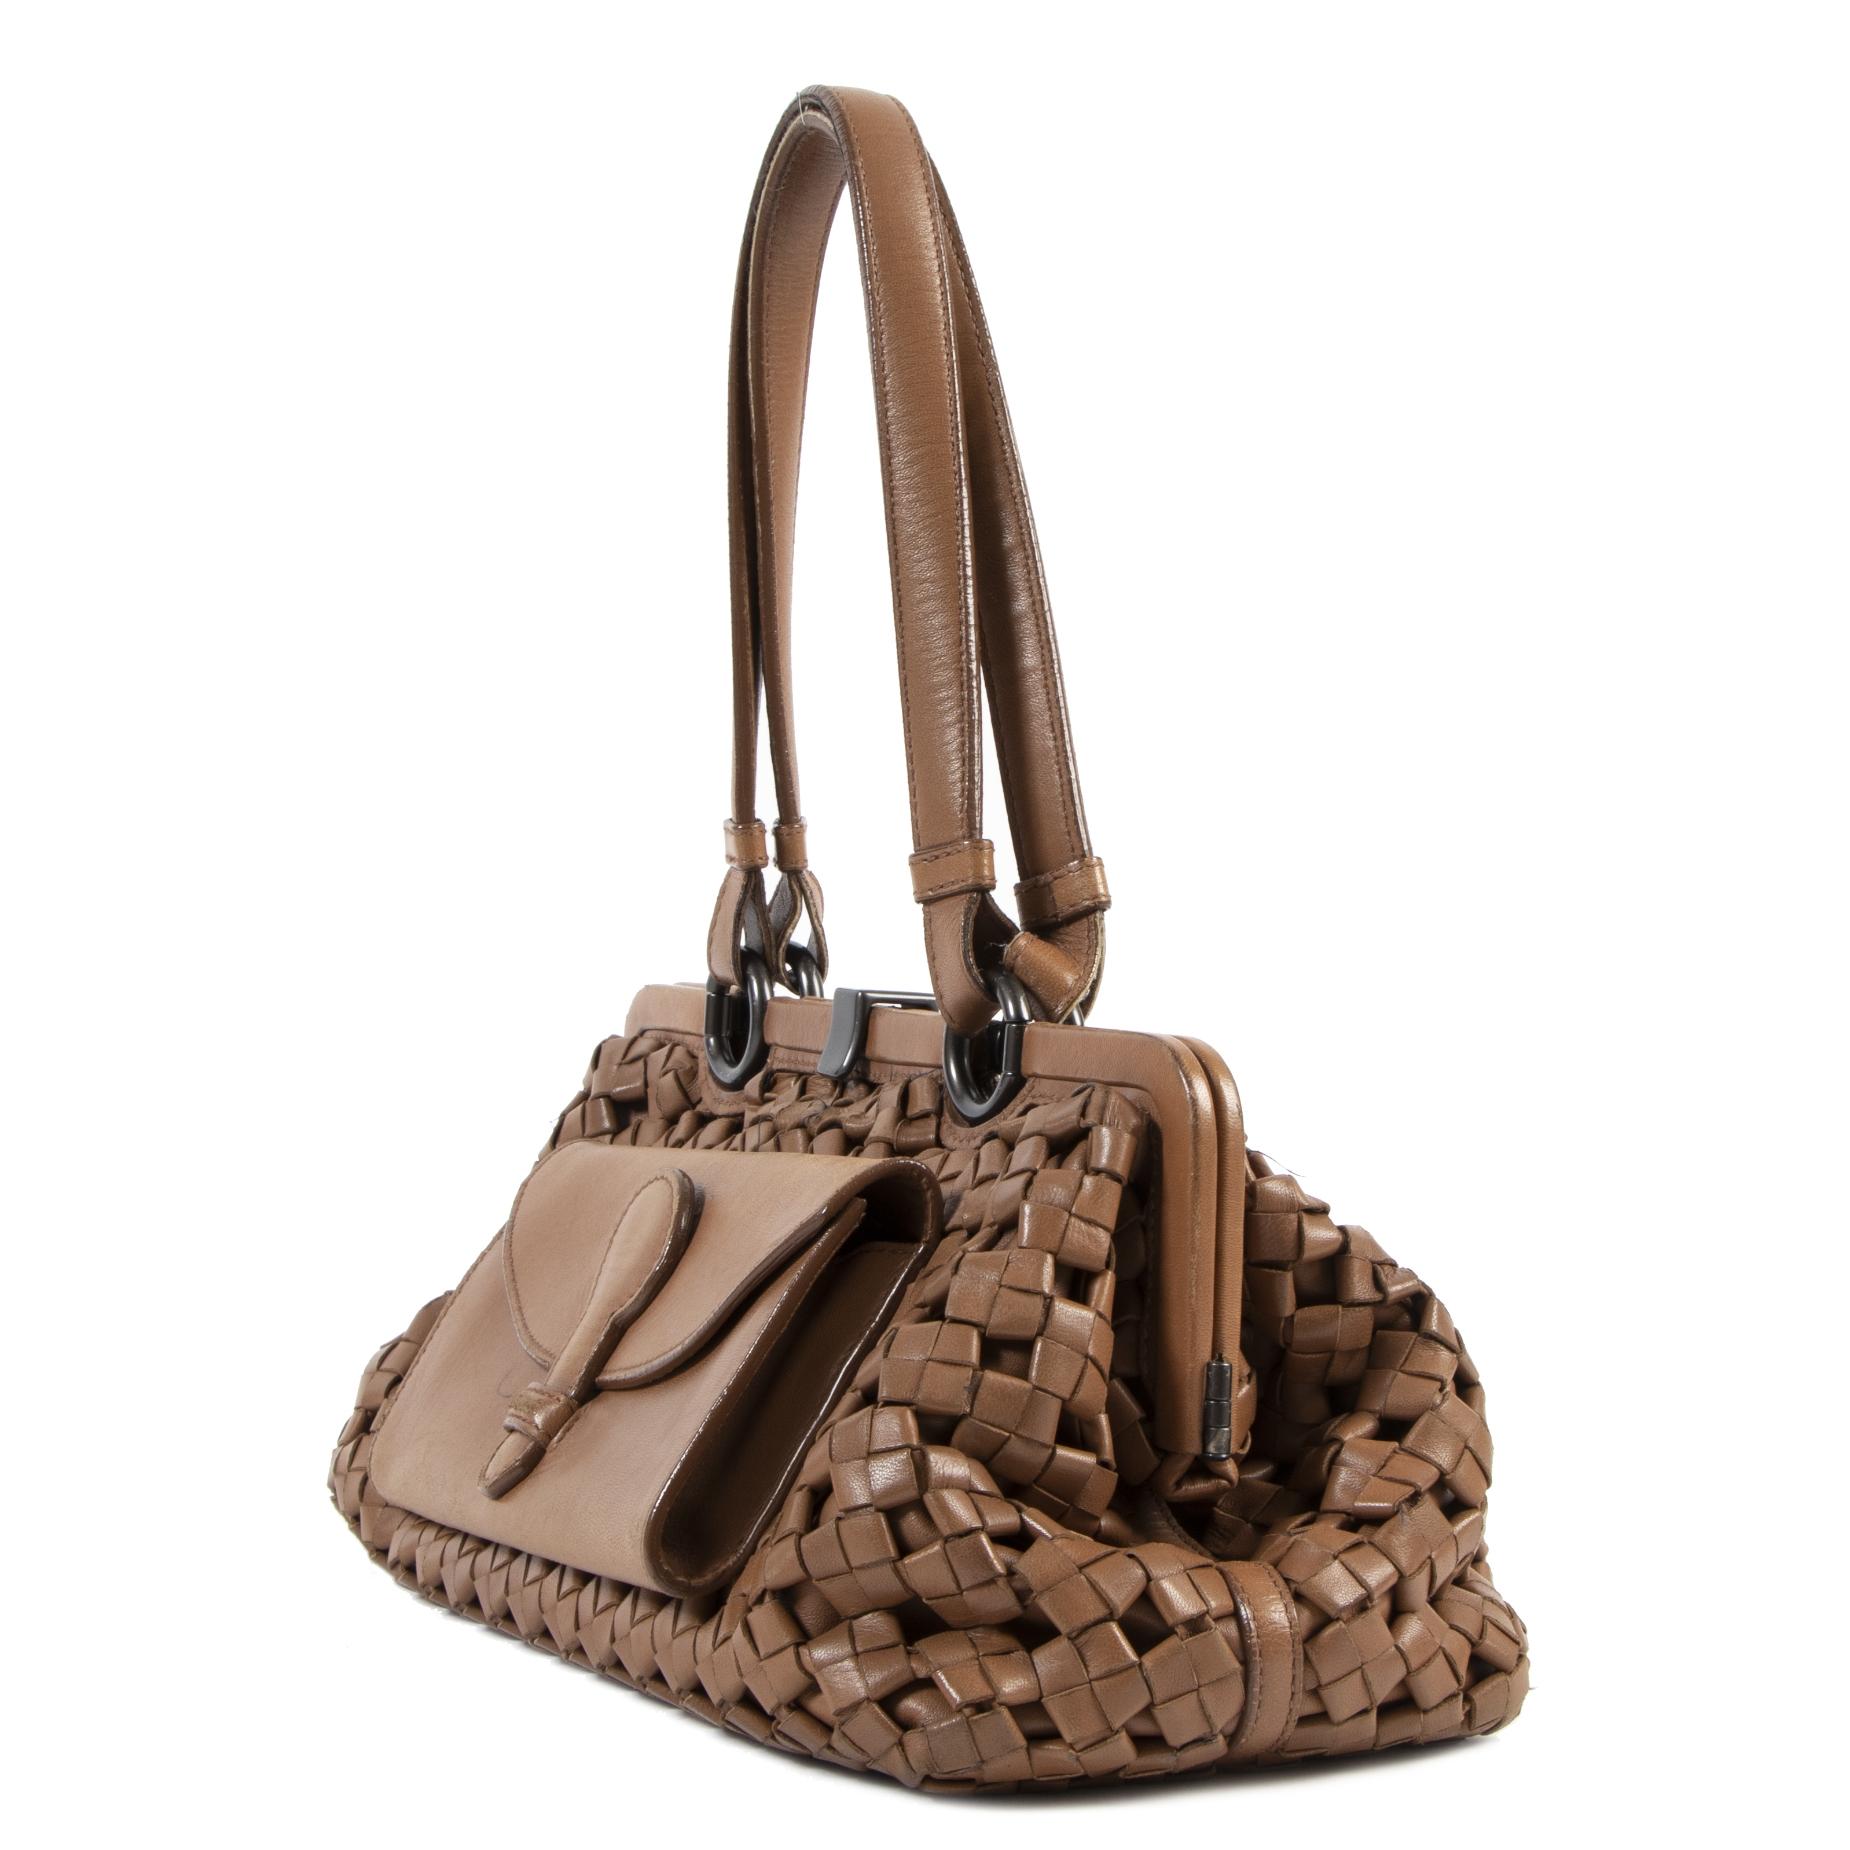 Bottega Veneta Brown Woven Shoulder Bag